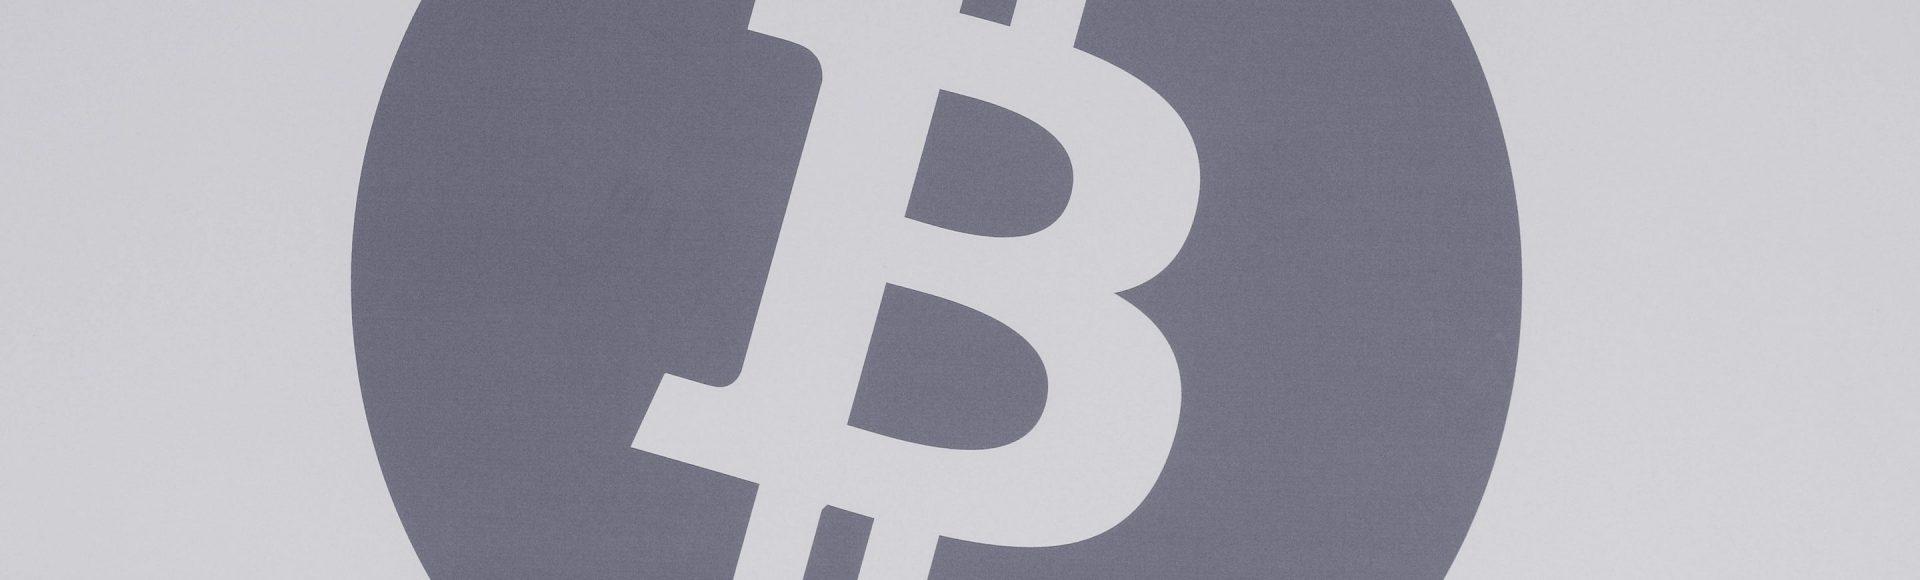 ARK-Invest_Blog-Banner_2015_09_24---Bitcoin-5_5